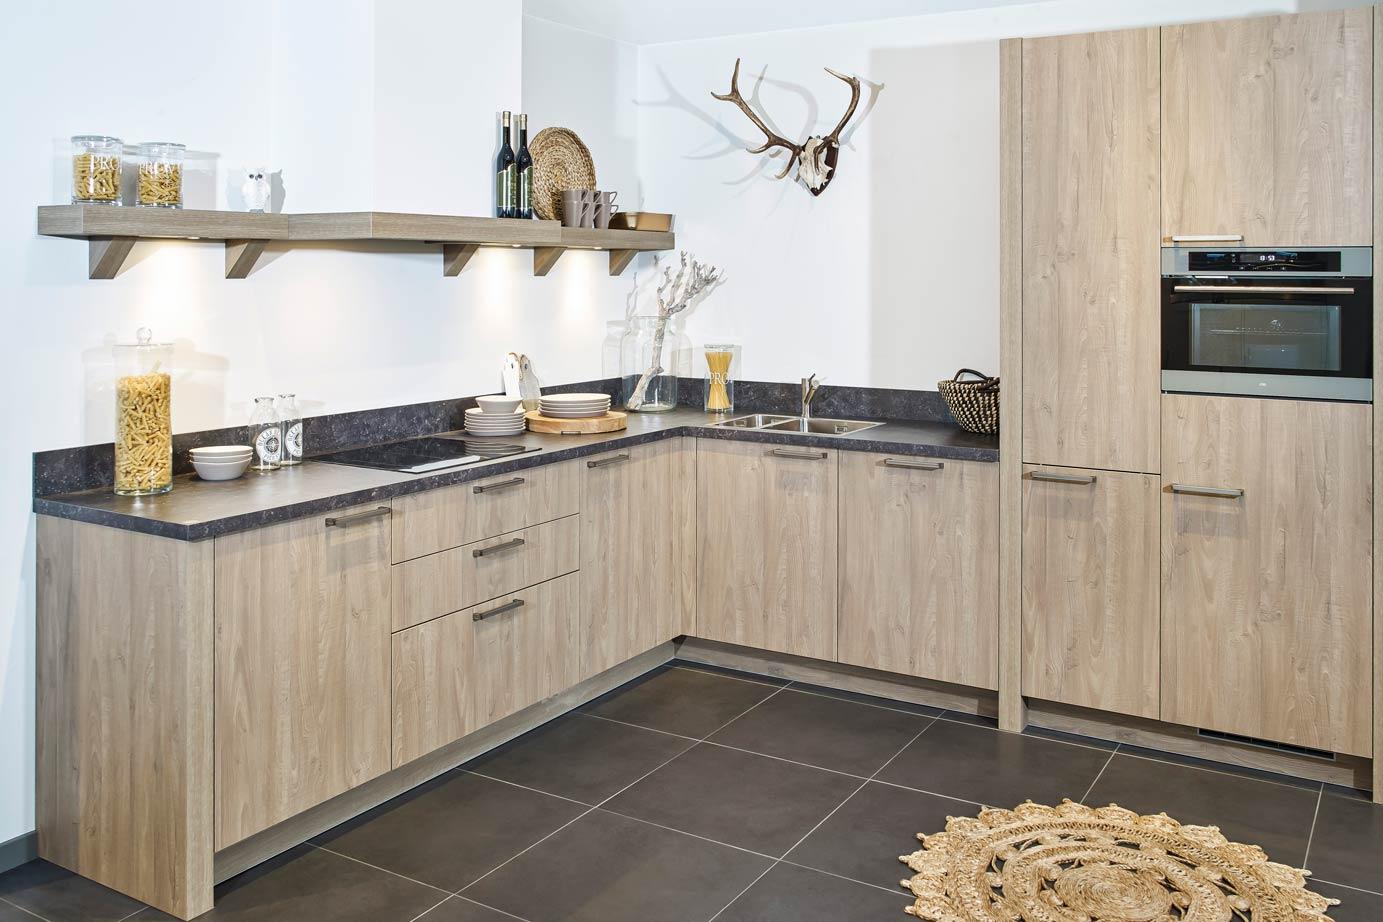 Keuken Eiken Houten : Old wood keukens eiken keukens natuurlijk schoon db keukens